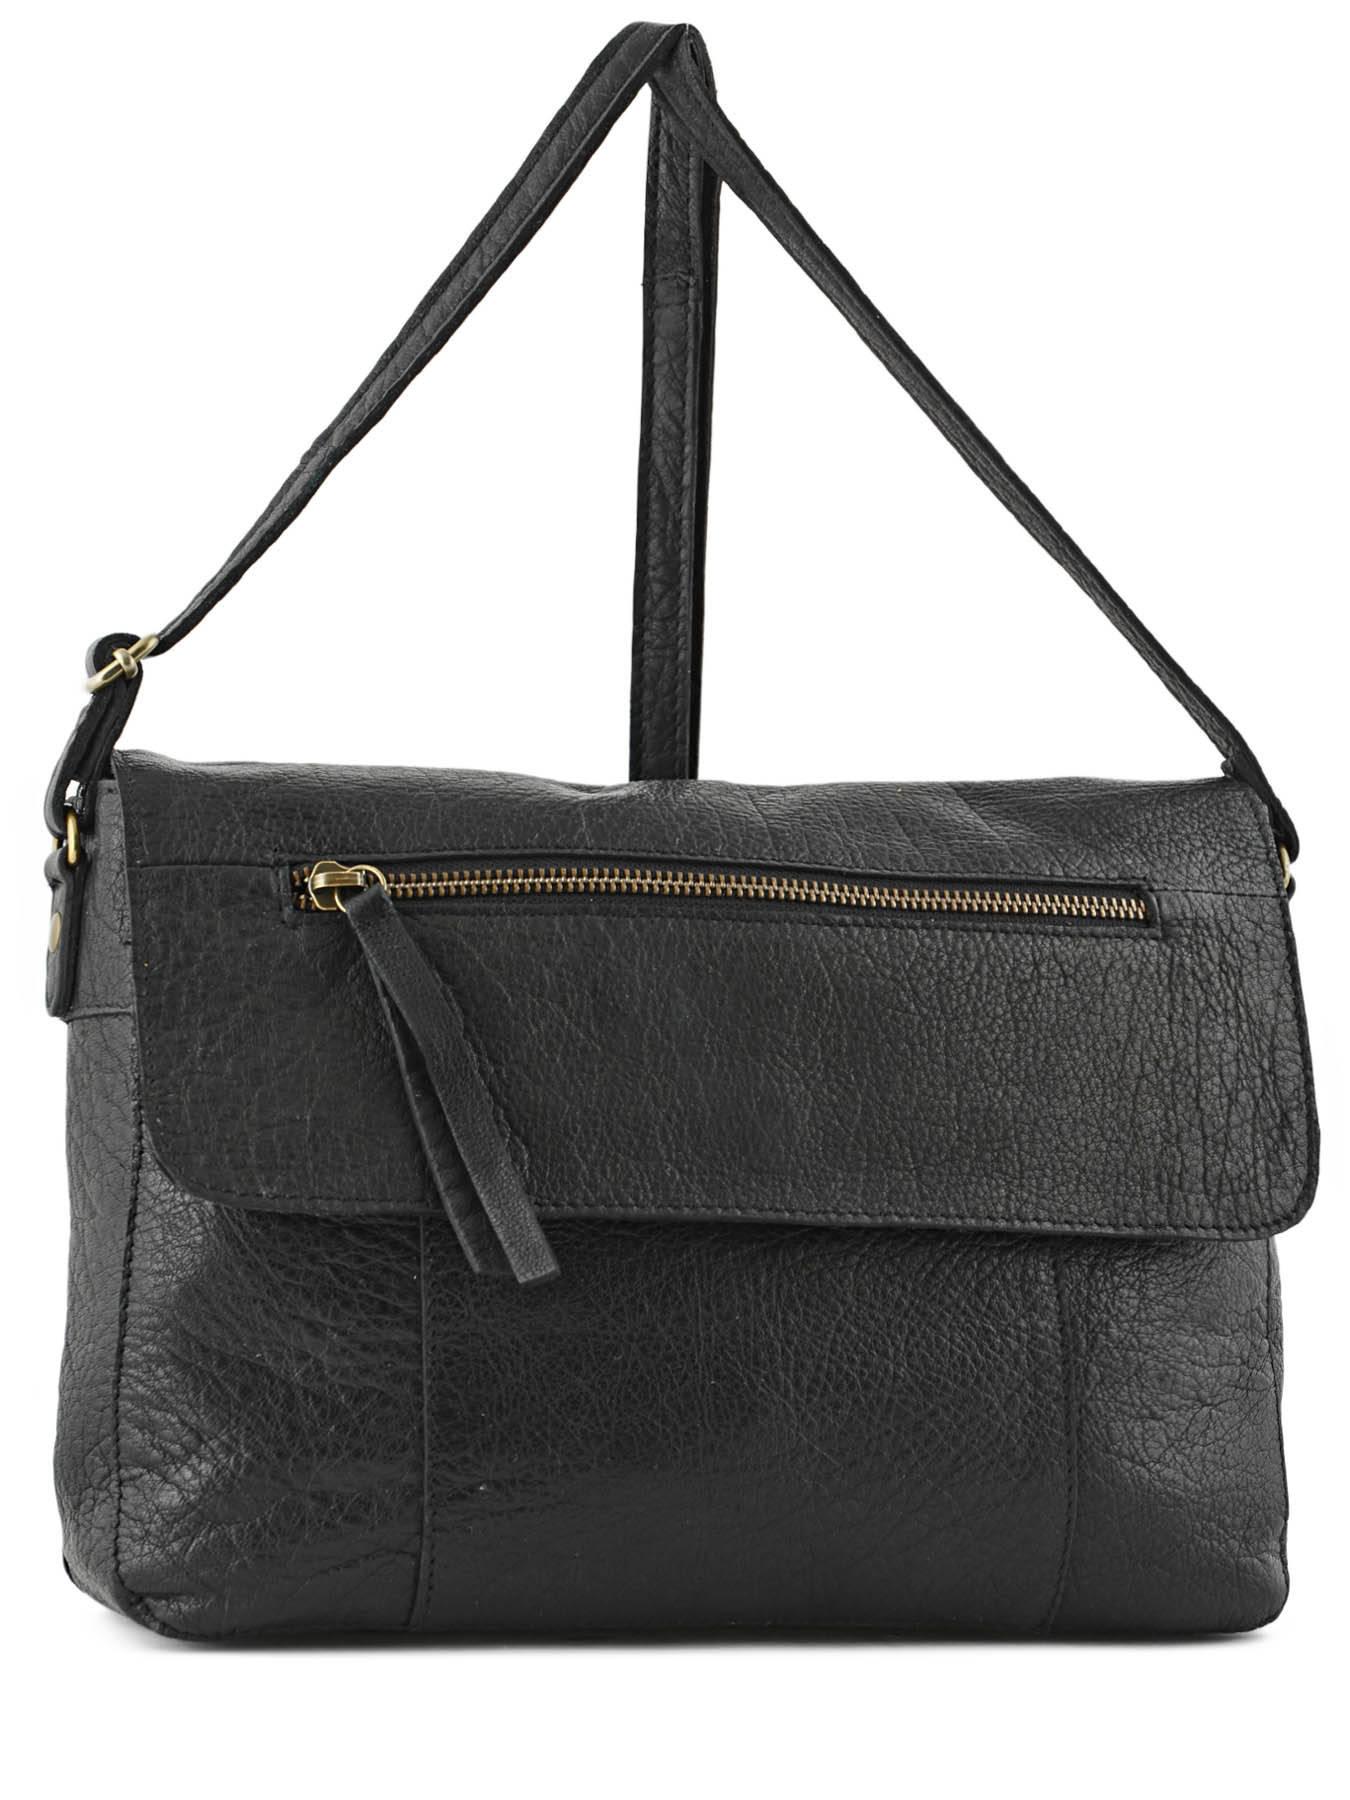 6a707b73e0d Pieces Crossbody bag KIMONO - free shipping available